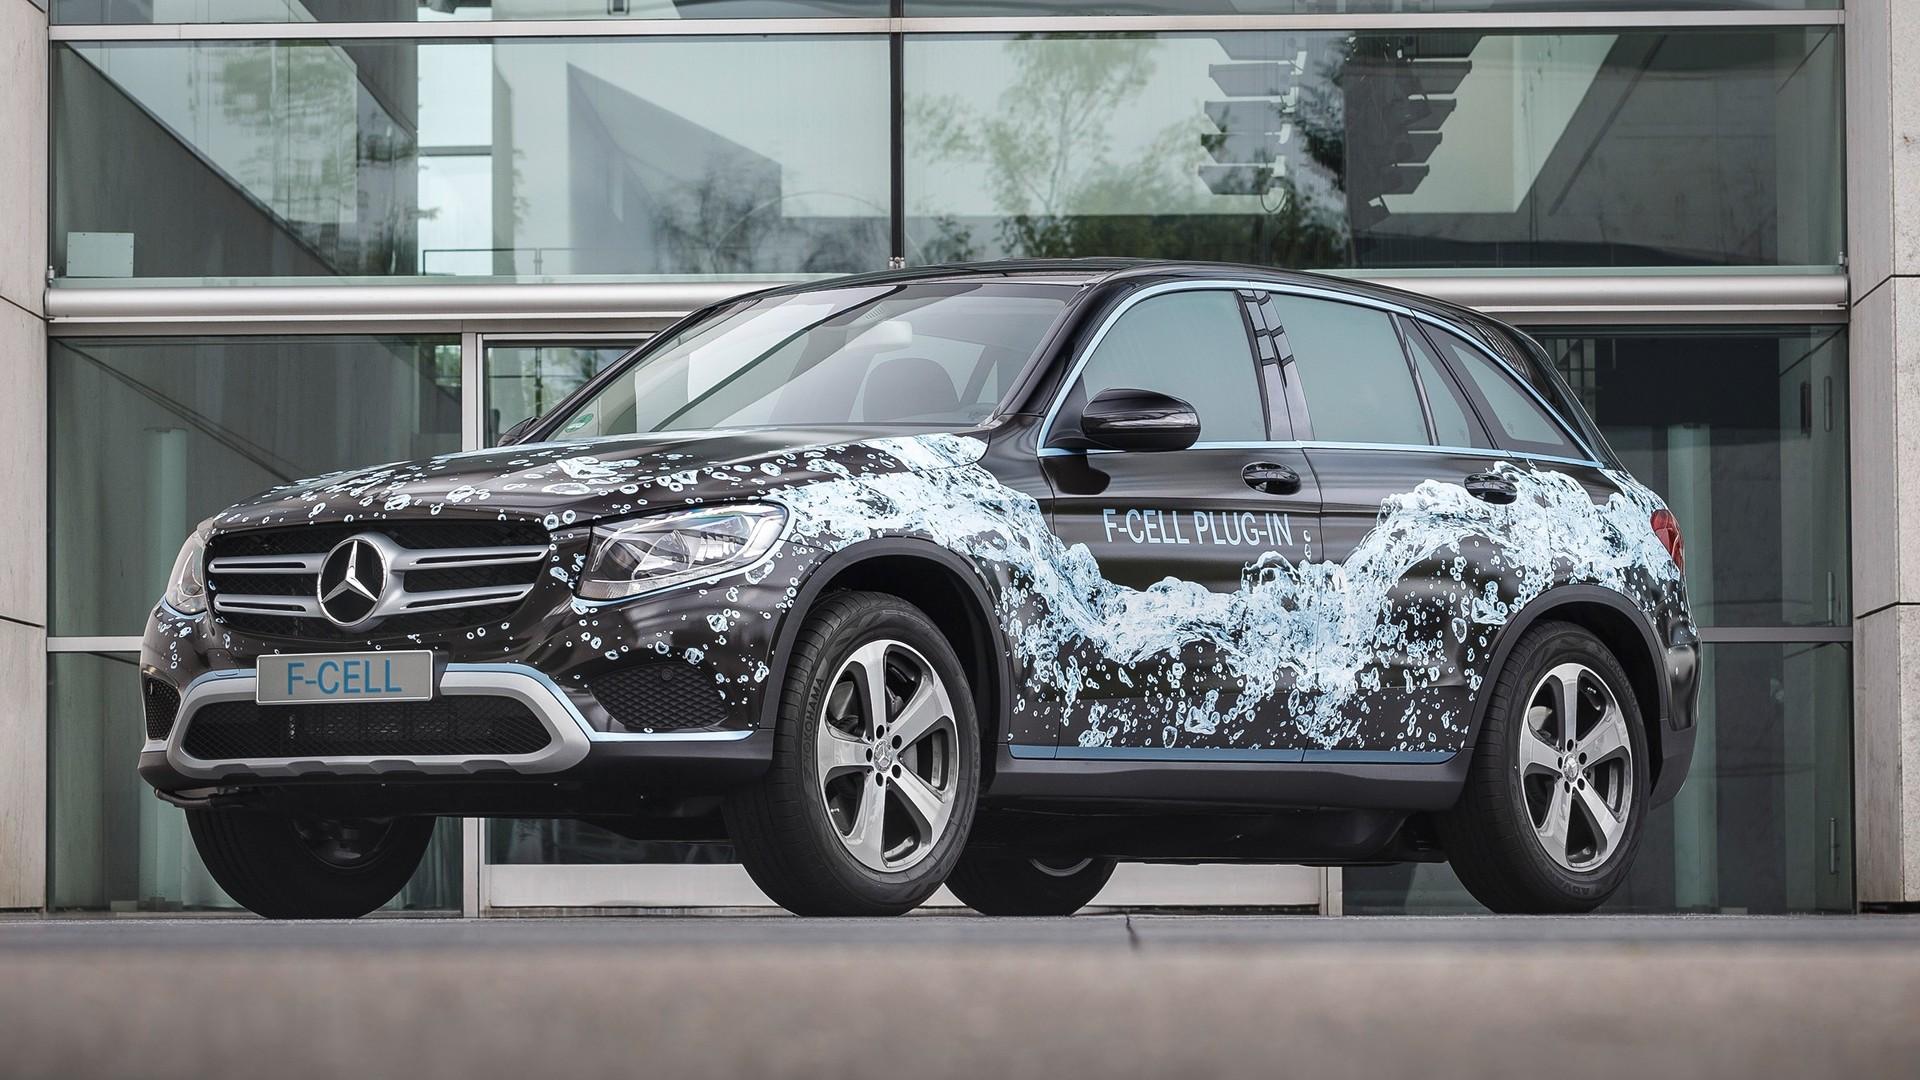 Mercedes-Benz GLC F-Cell 2017 hydrogen crossover 14